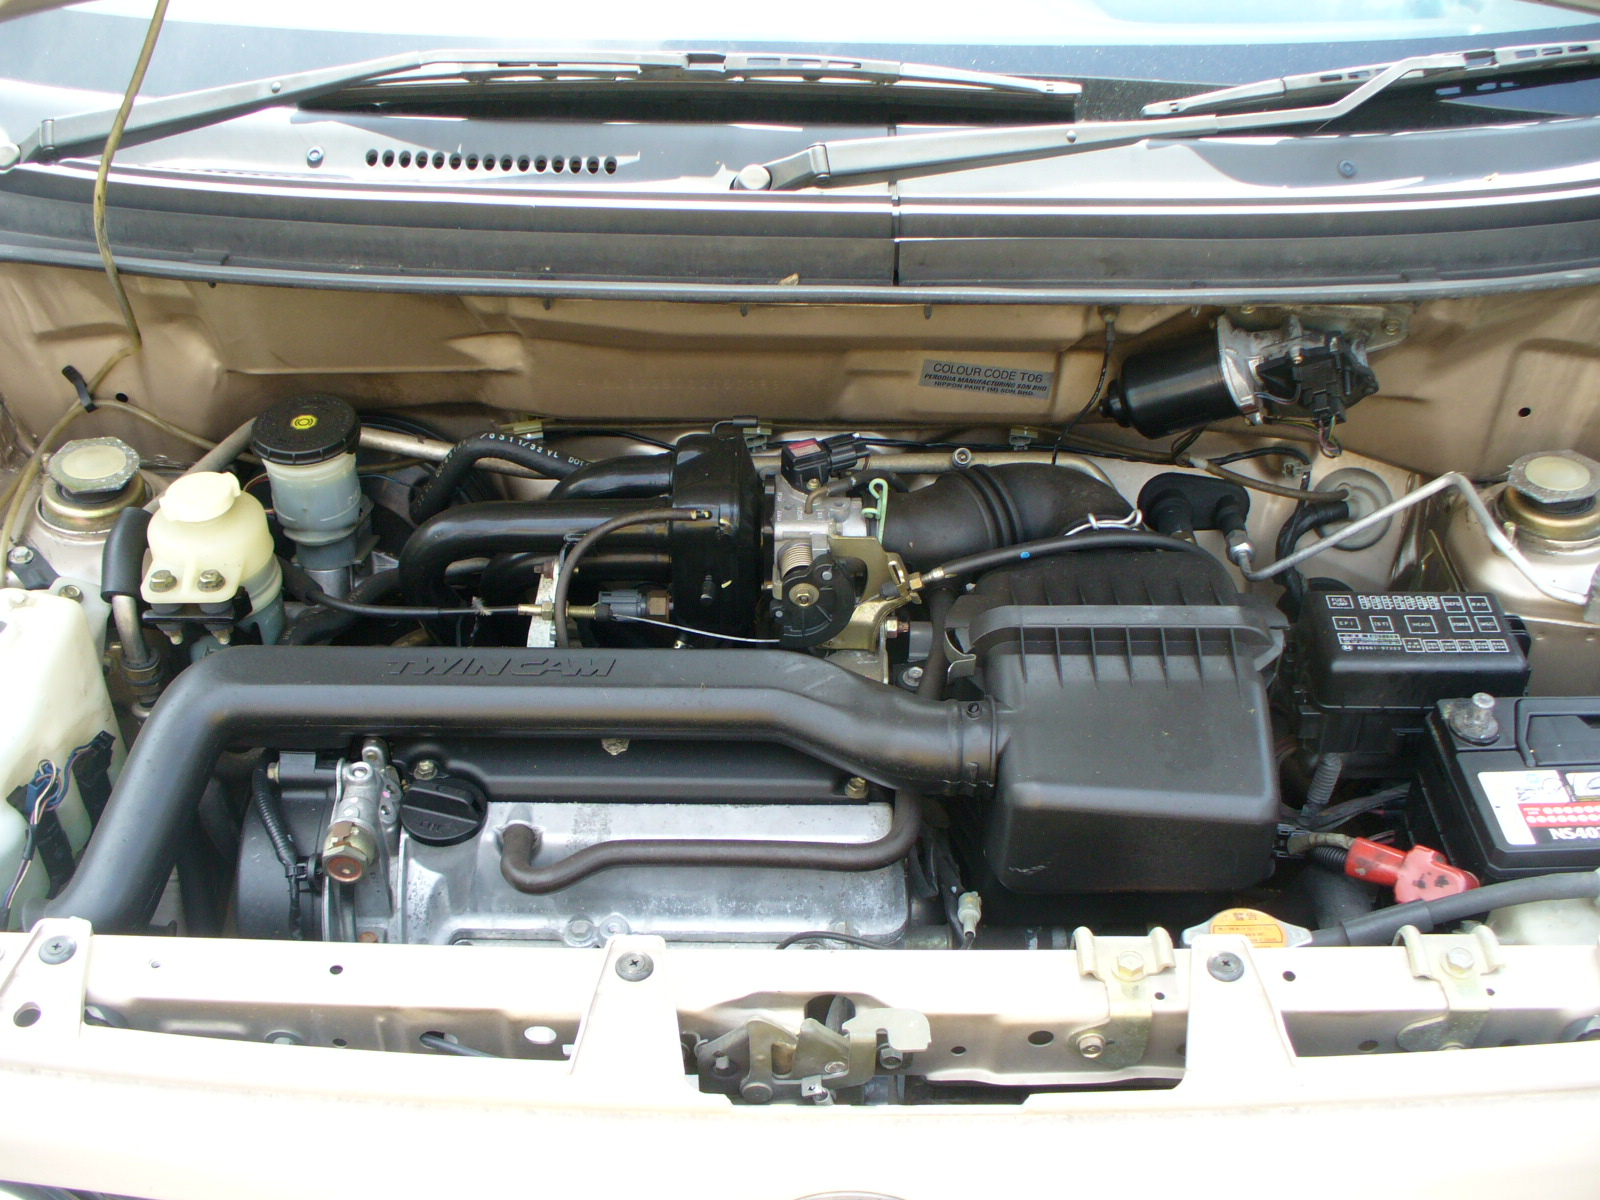 Perodua Kancil 850 Carburetor